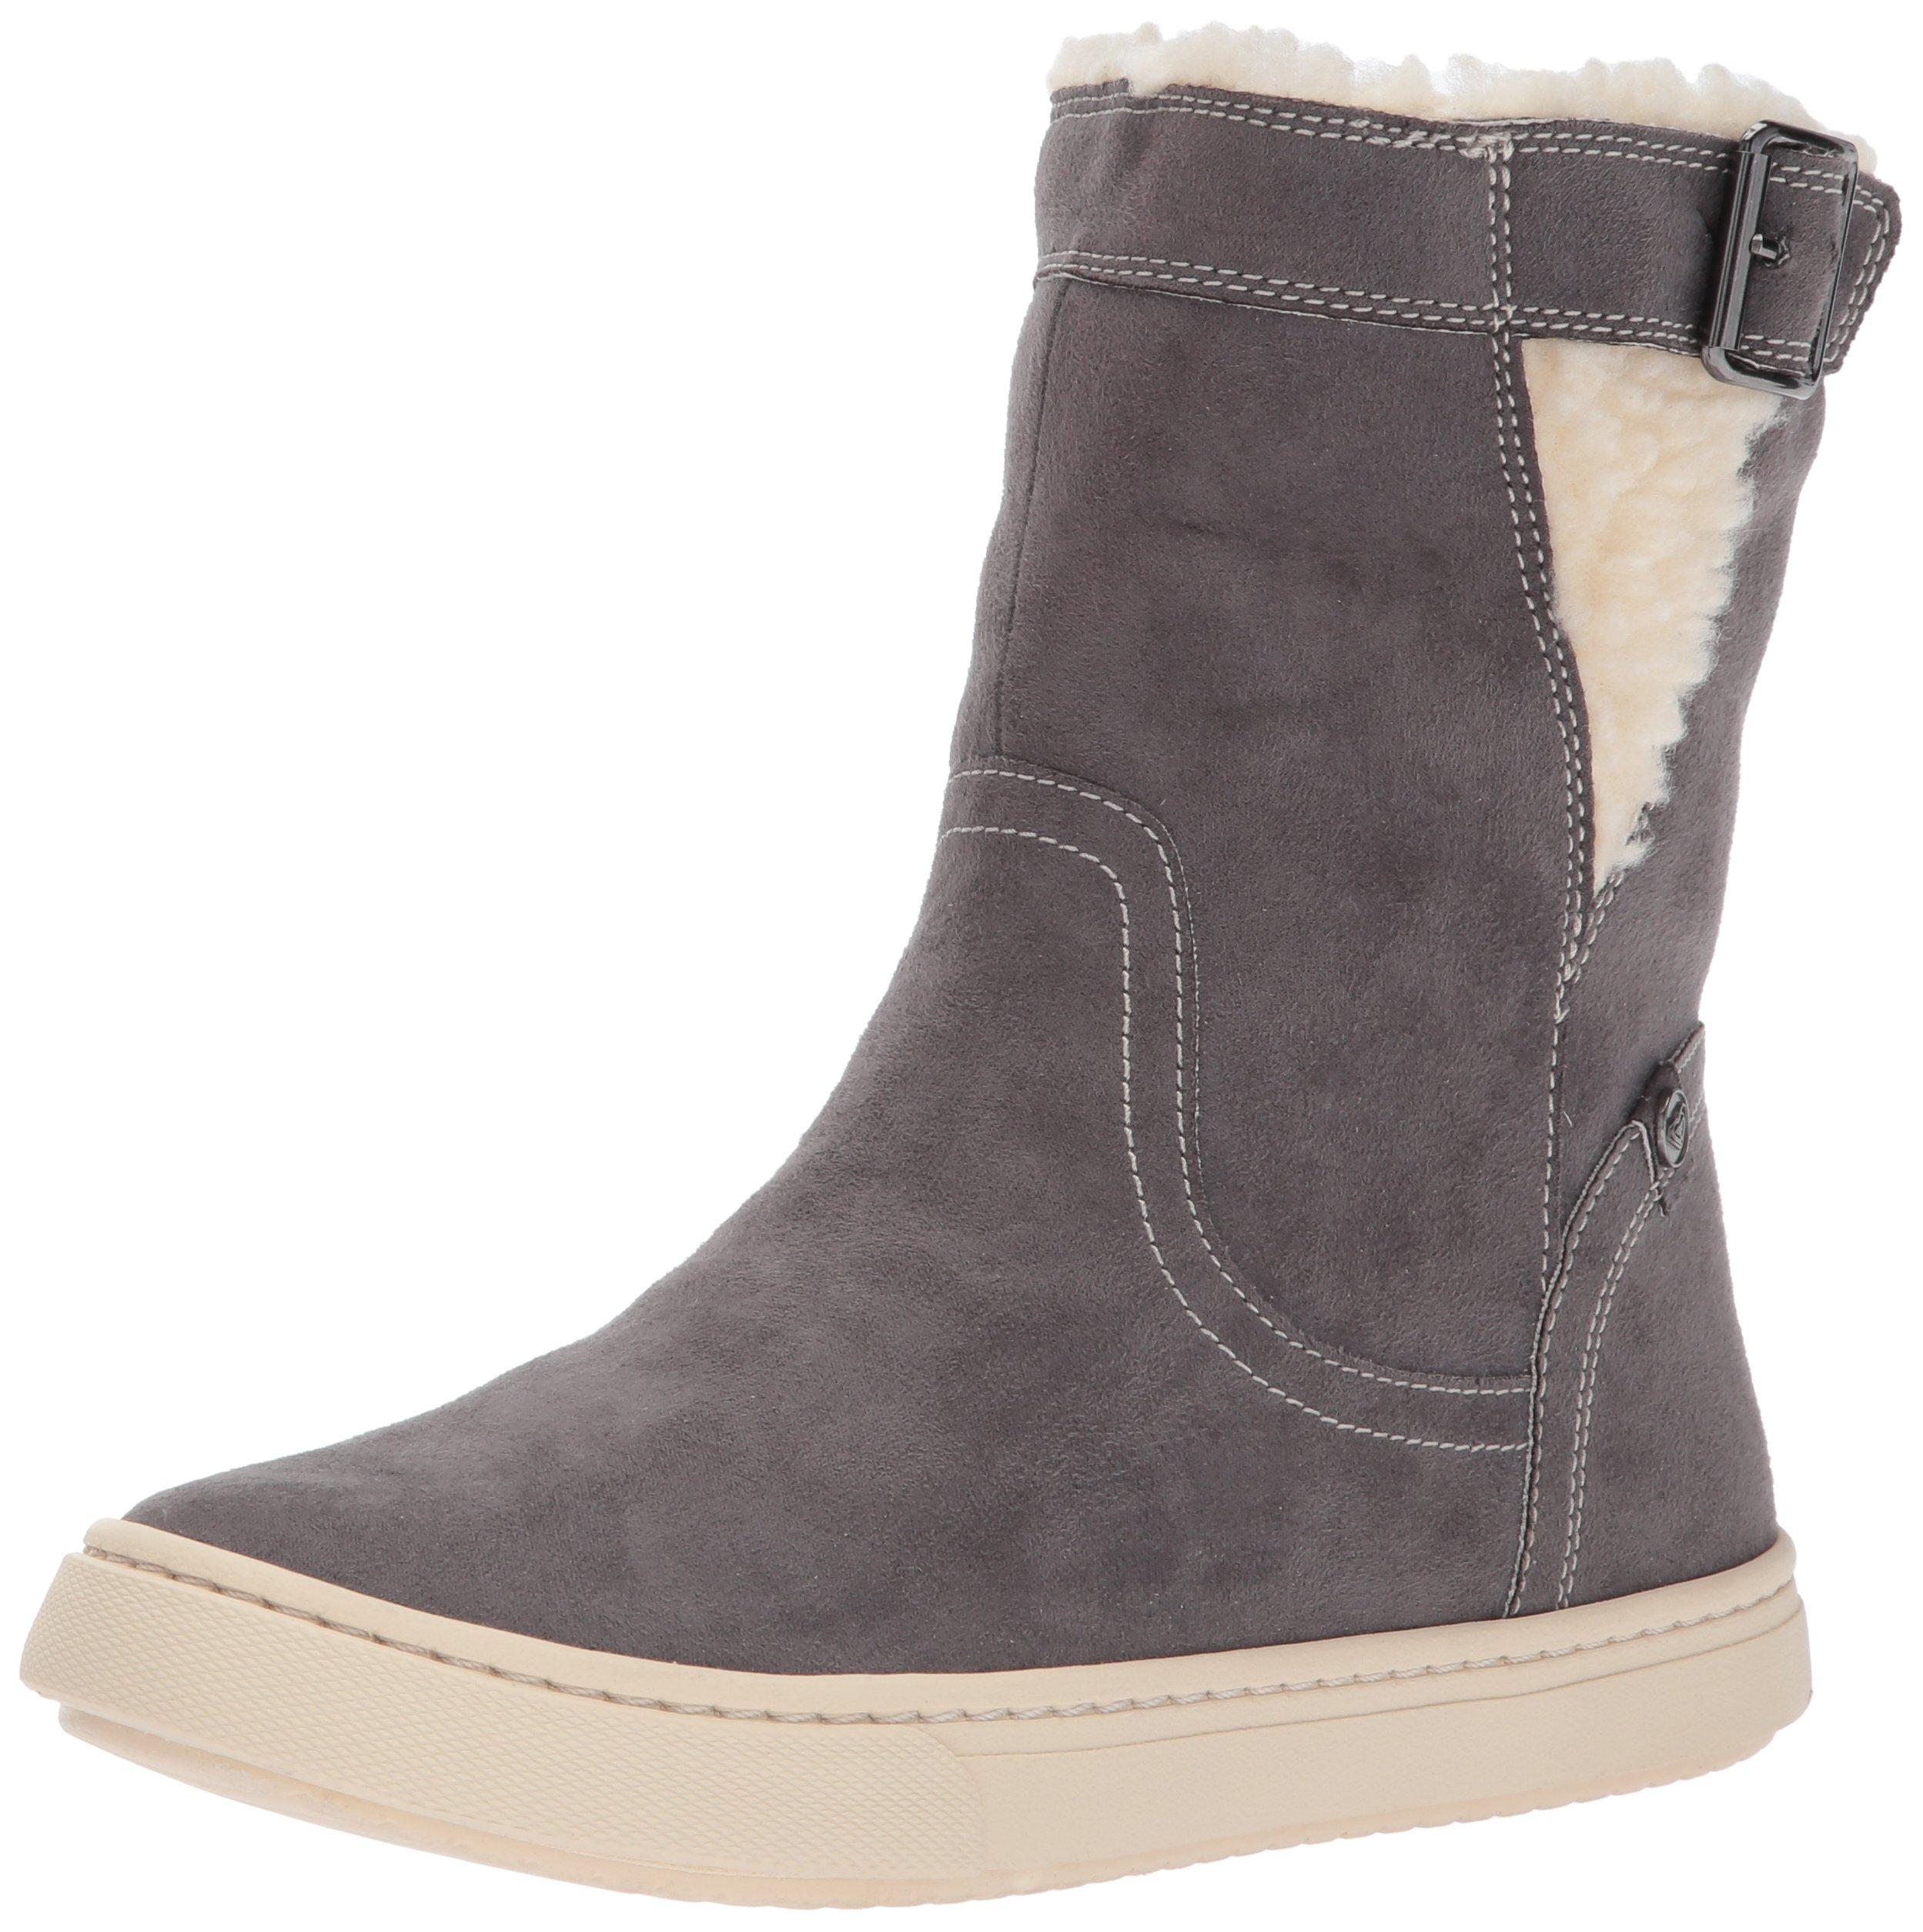 Roxy Women's Blake Mid Faux Suede Shoe Fashion Sneaker, Charcoal, 8 M US